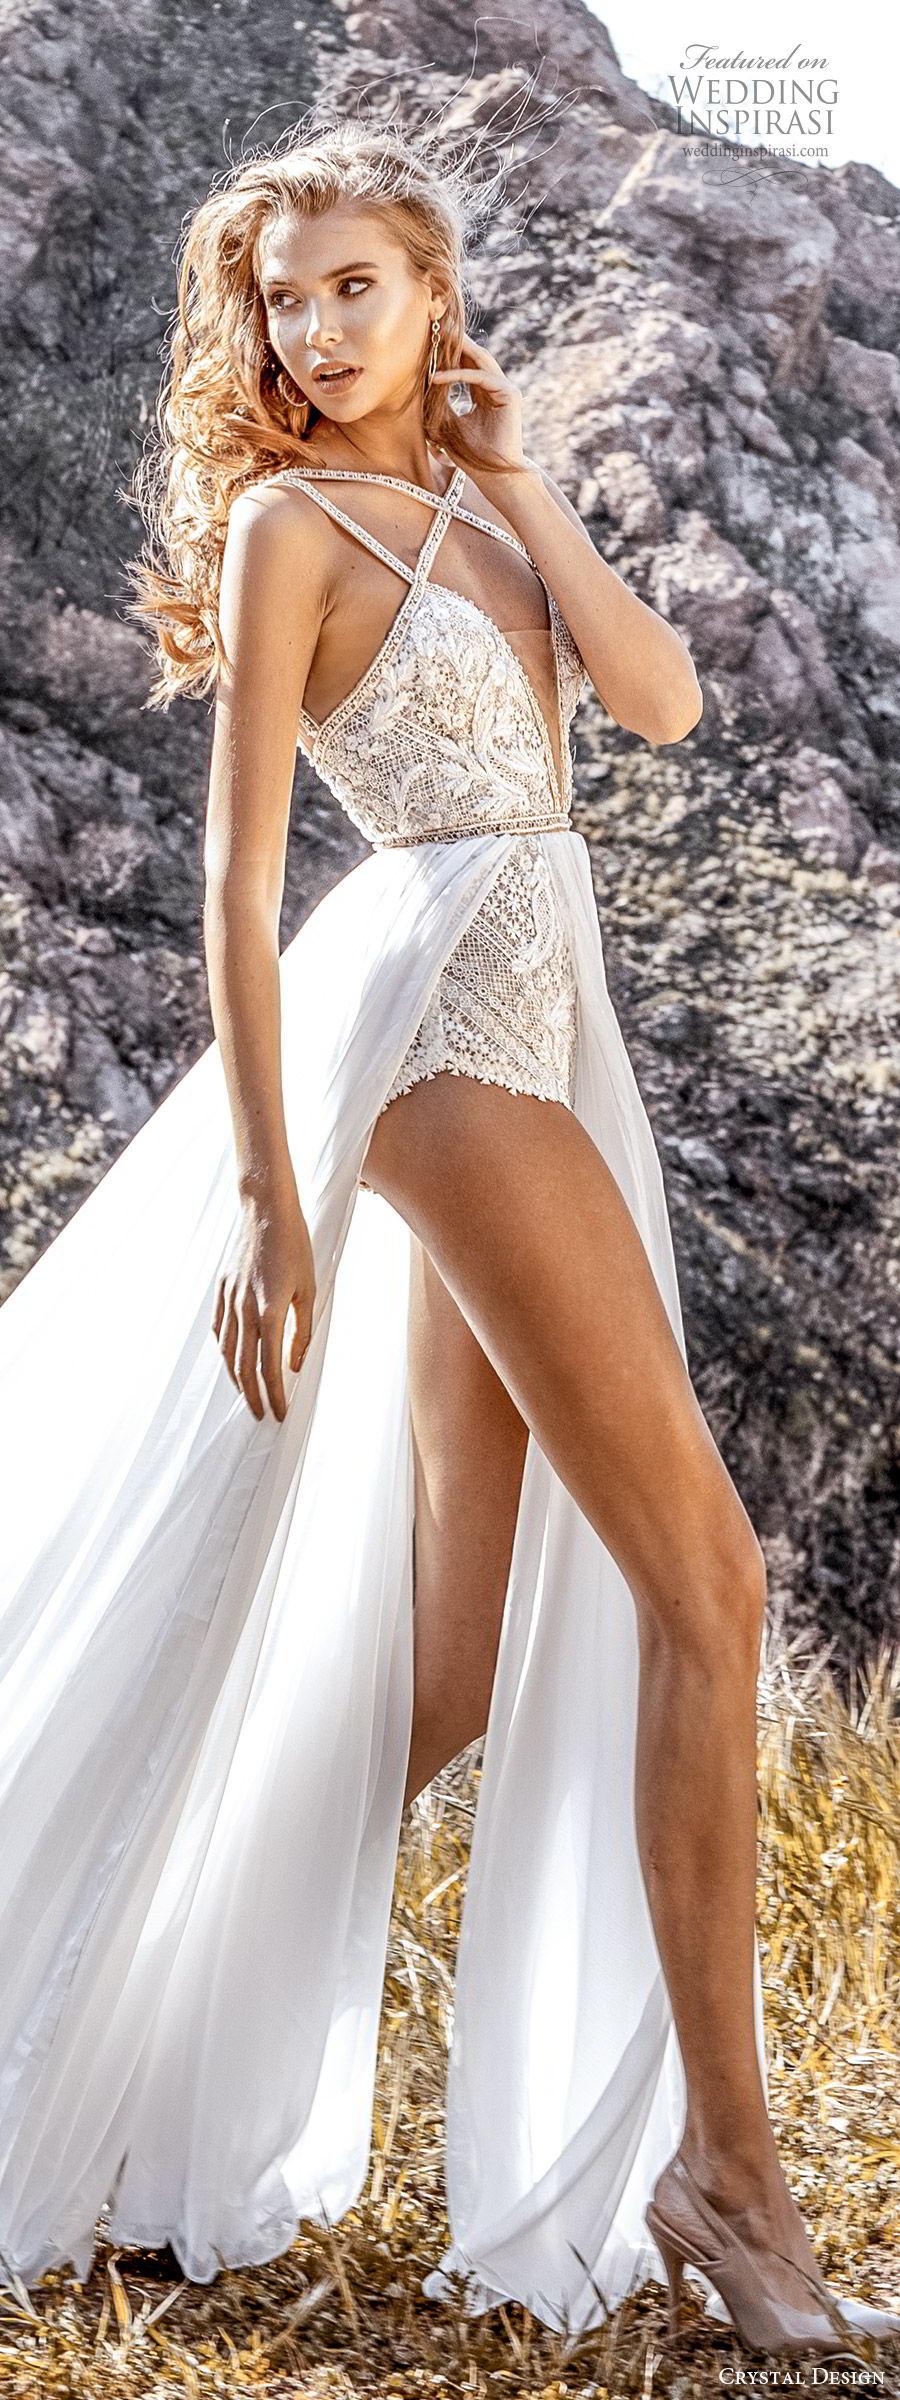 crystal design 2020 couture bridal sleeveless beaded straps plunging split sweetheart neckline bodysuit aline wedding dress slit sheer skirt (2) sexy modern chapel train sv